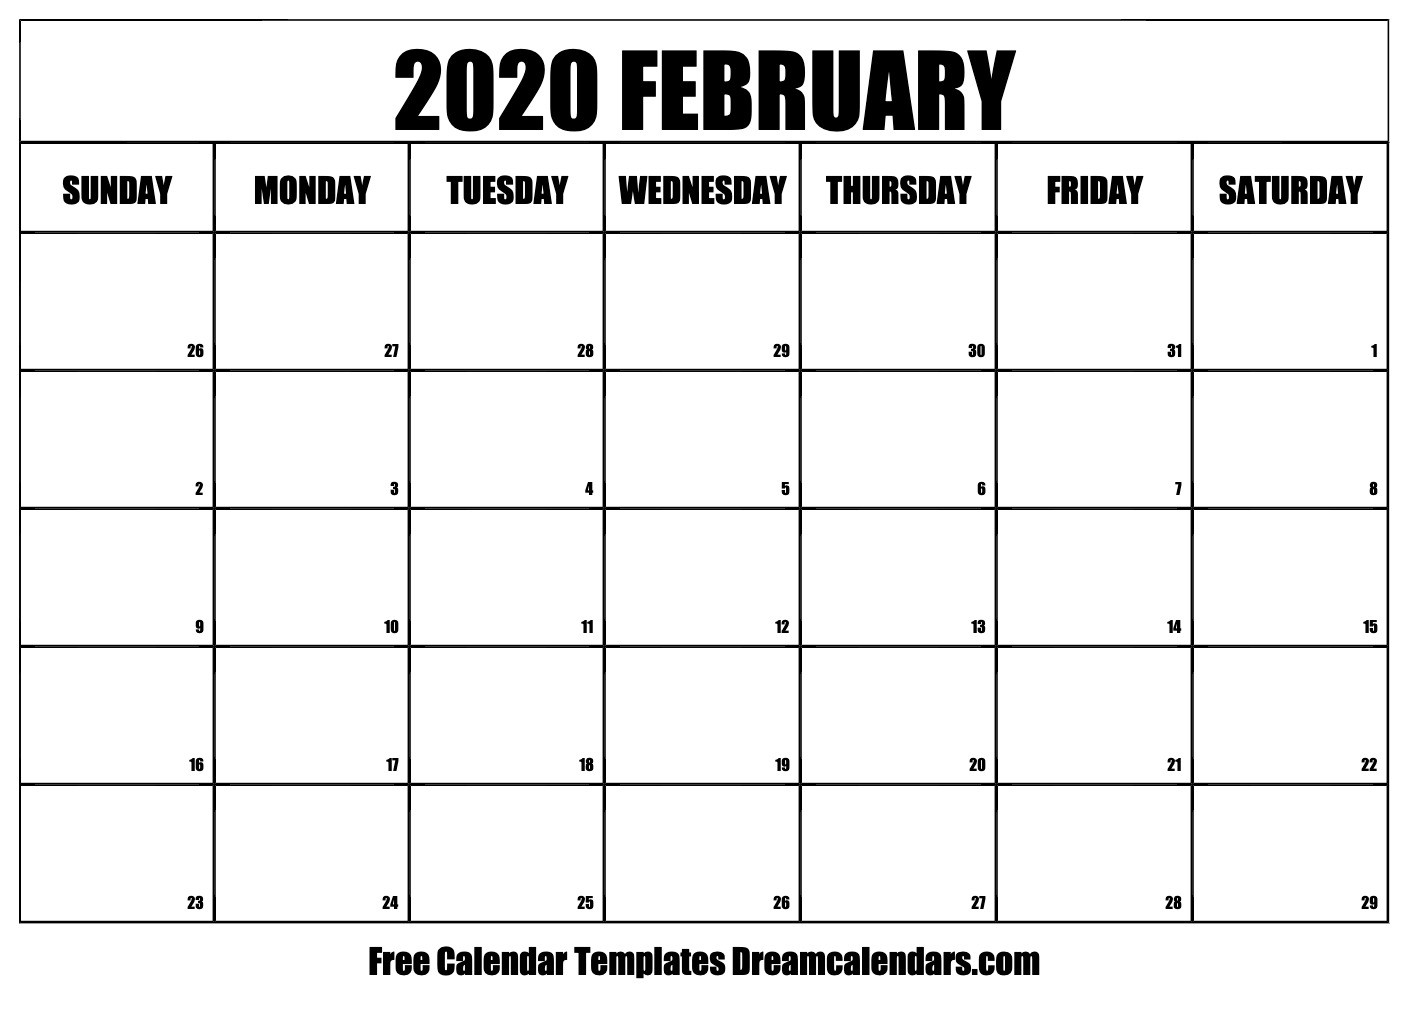 February 2020 Printable Calendar Free Free Blank February 2020 Printable Calendar